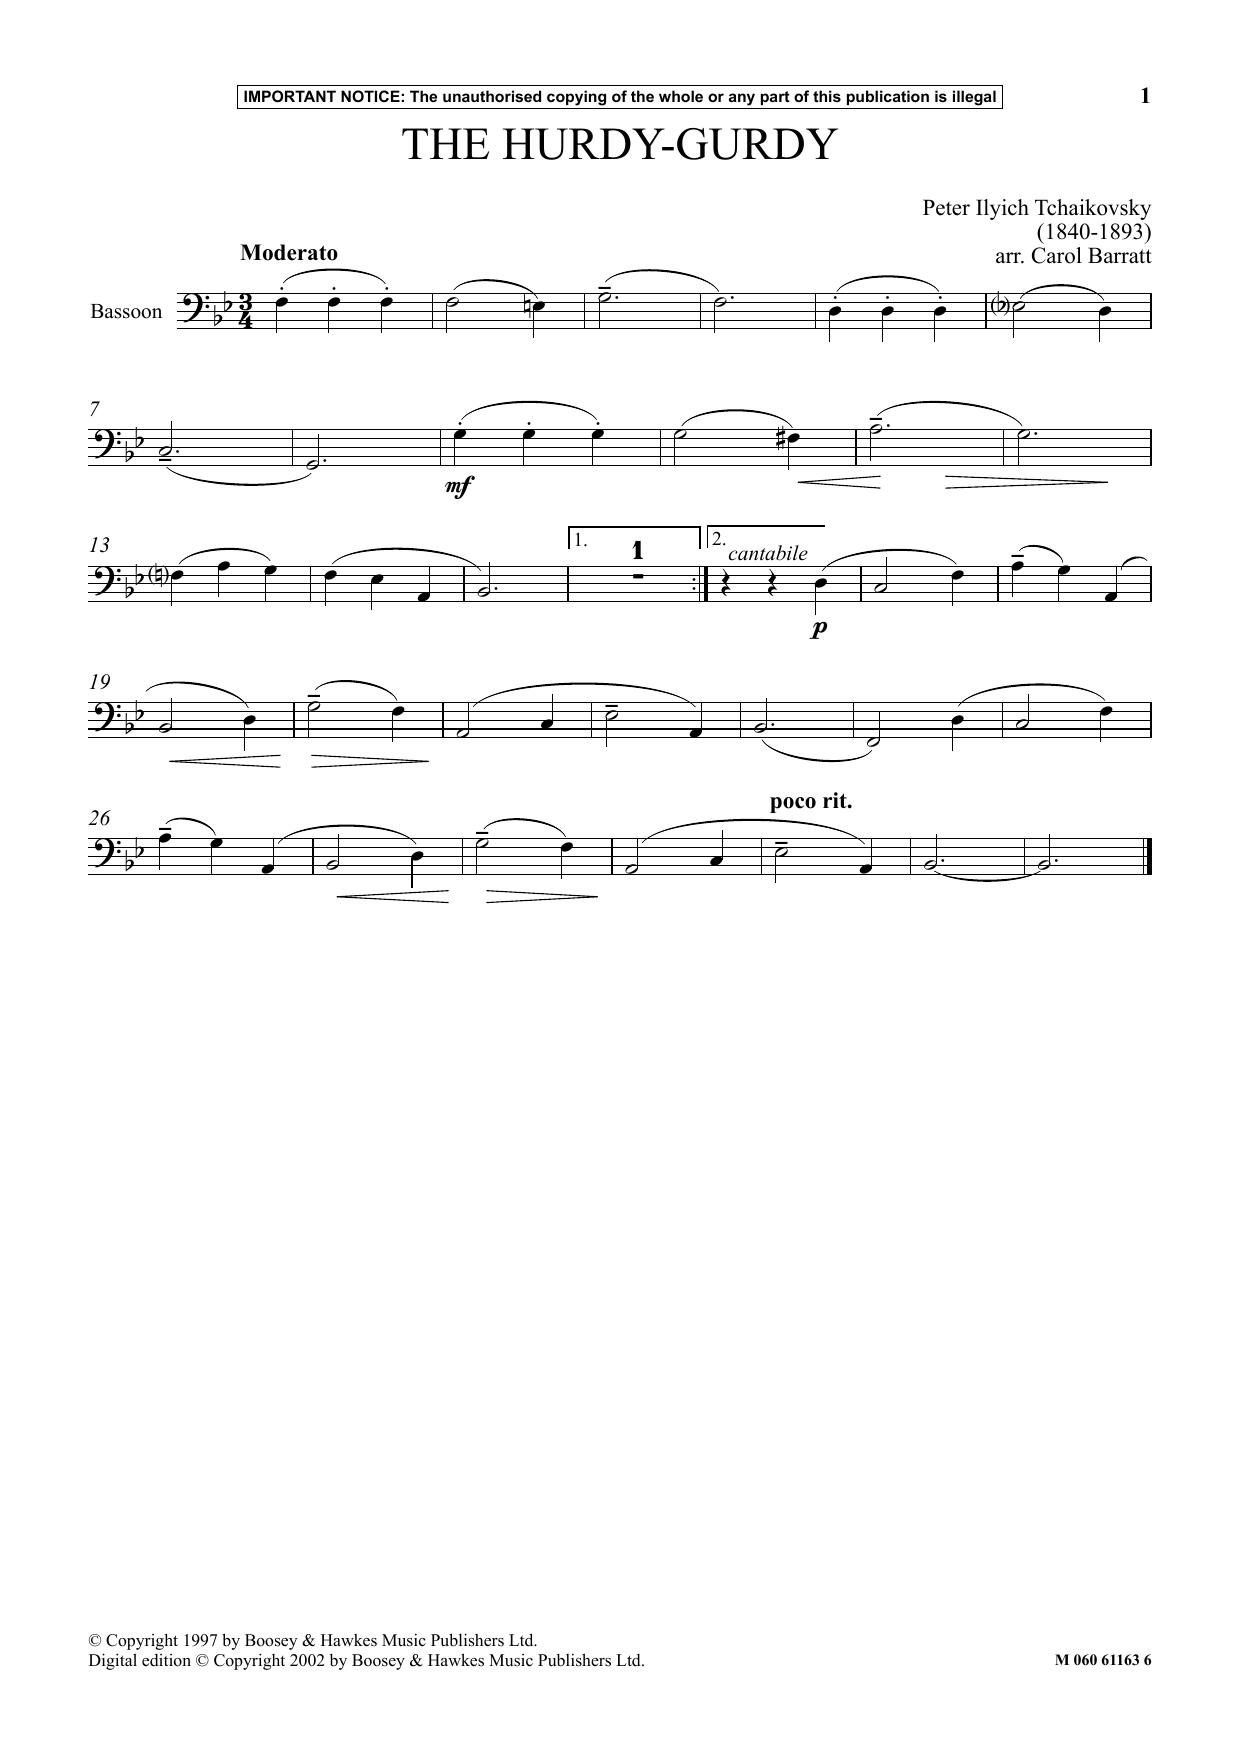 The Hurdy-Gurdy (Instrumental Solo)